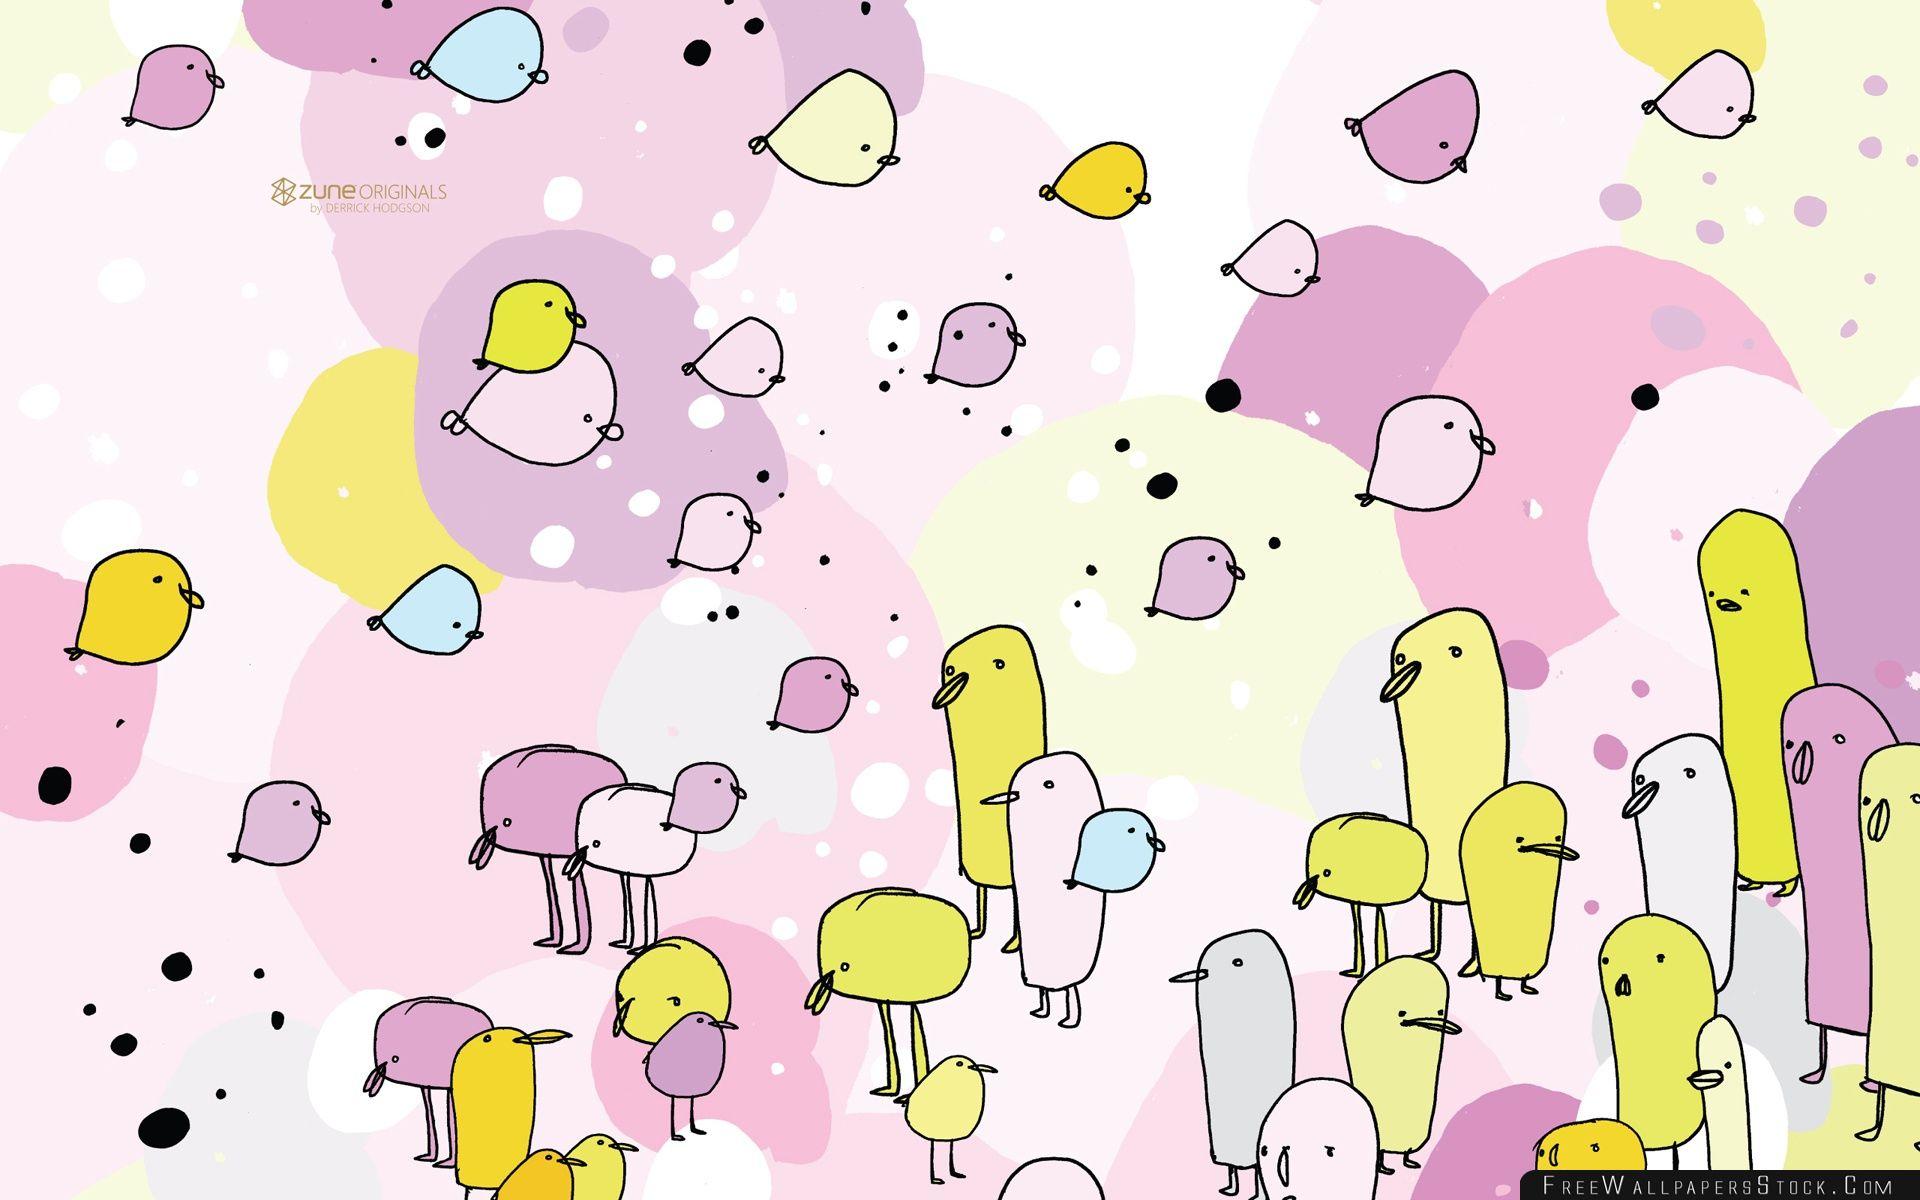 Download Free Wallpaper Zune Birds